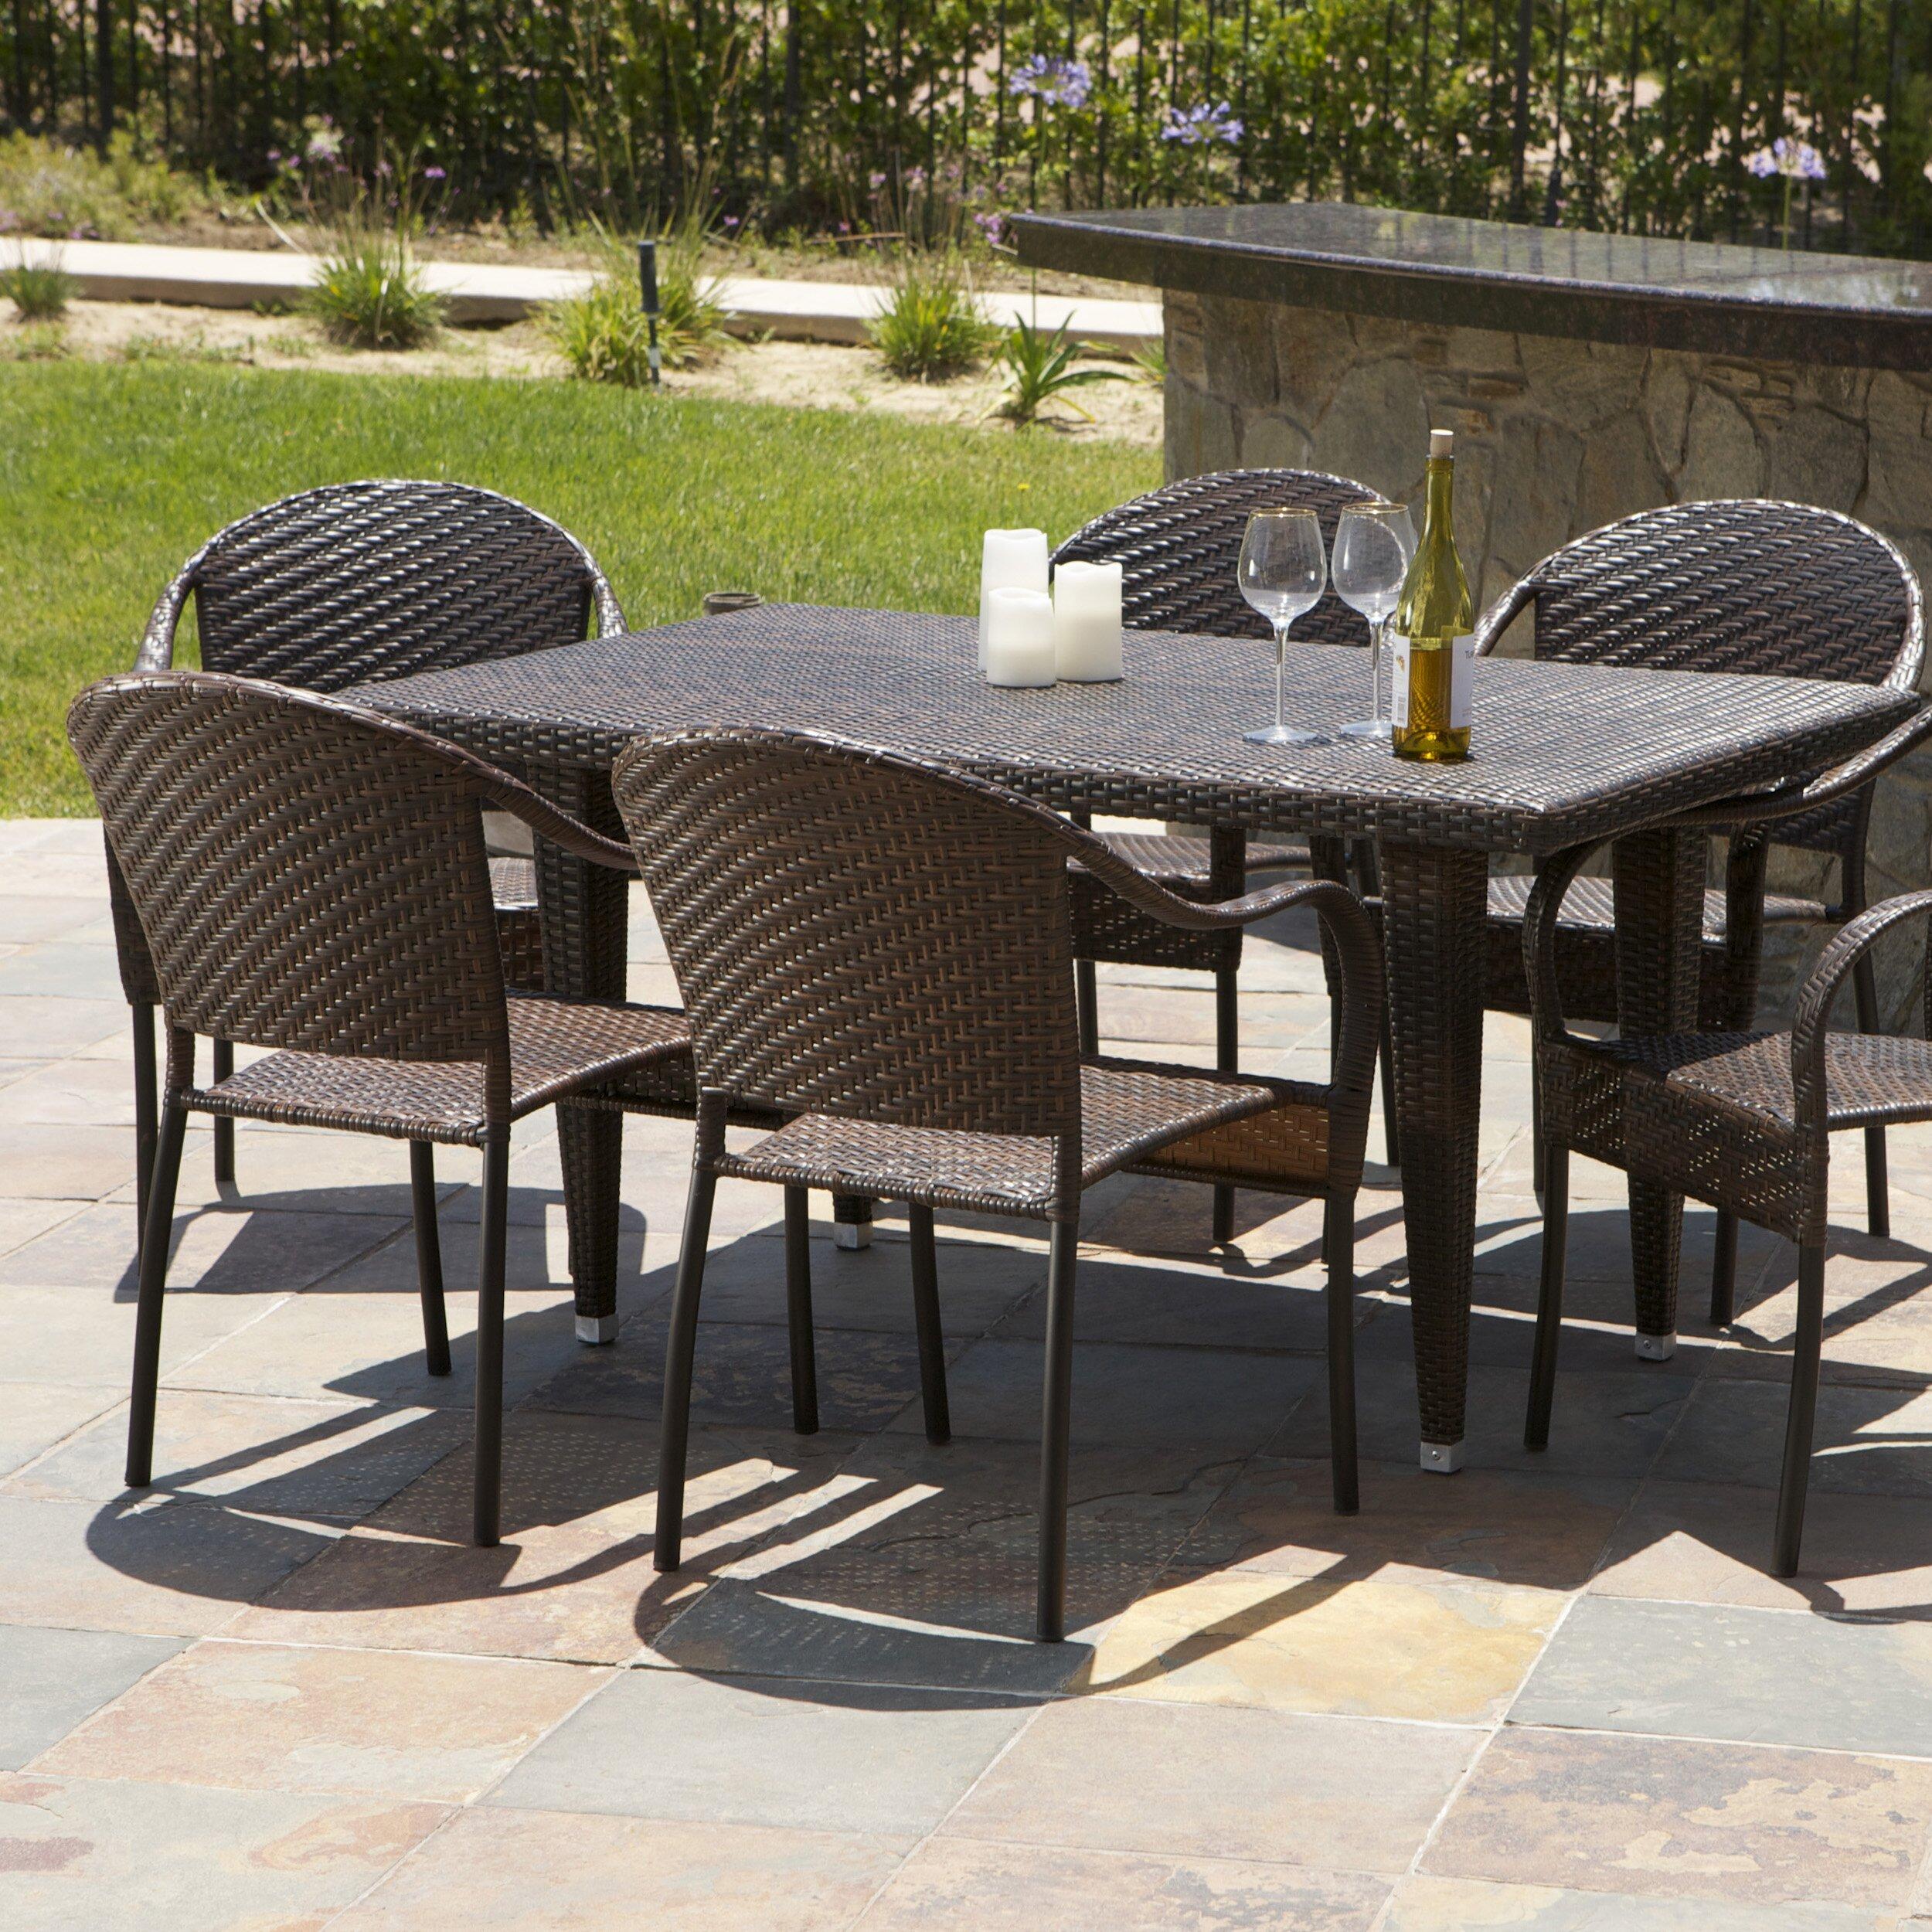 Home Loft Concepts Dimke 7pc Polyethylene Wicker Outdoor Dining Set